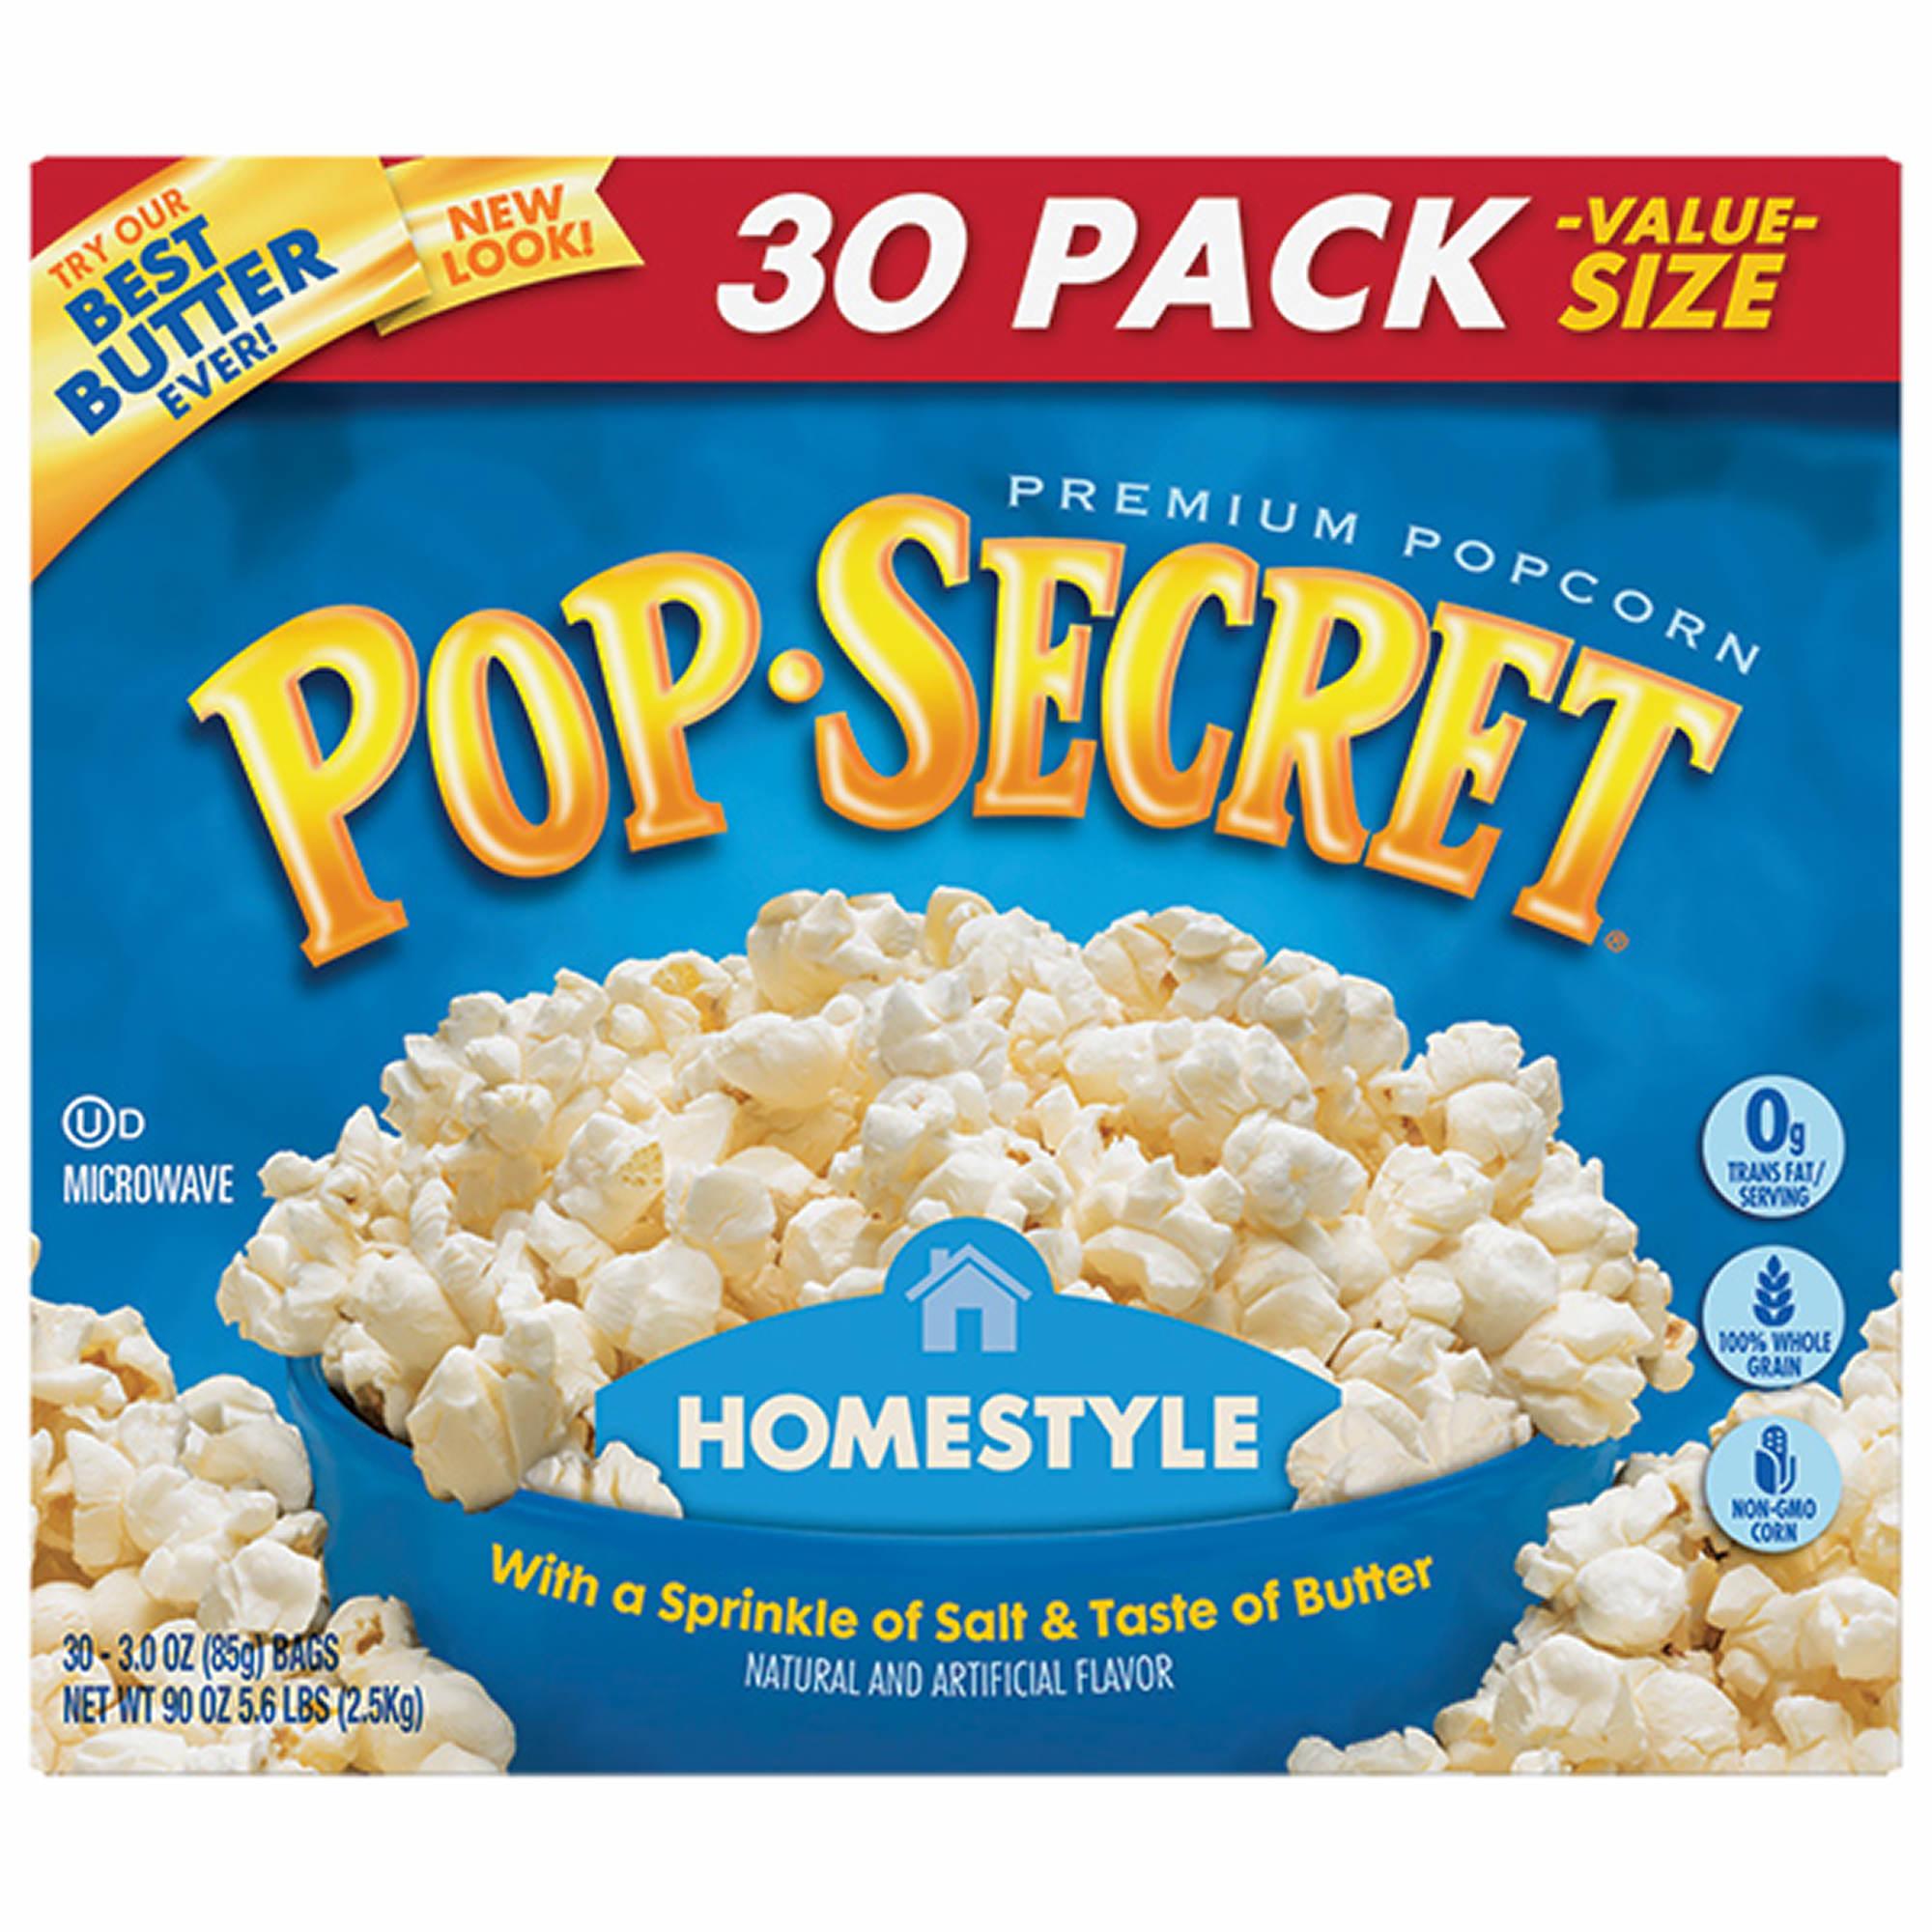 Pop Secret Homestyle Microwave Popcorn, 30 ct. - BJs WholeSale Club